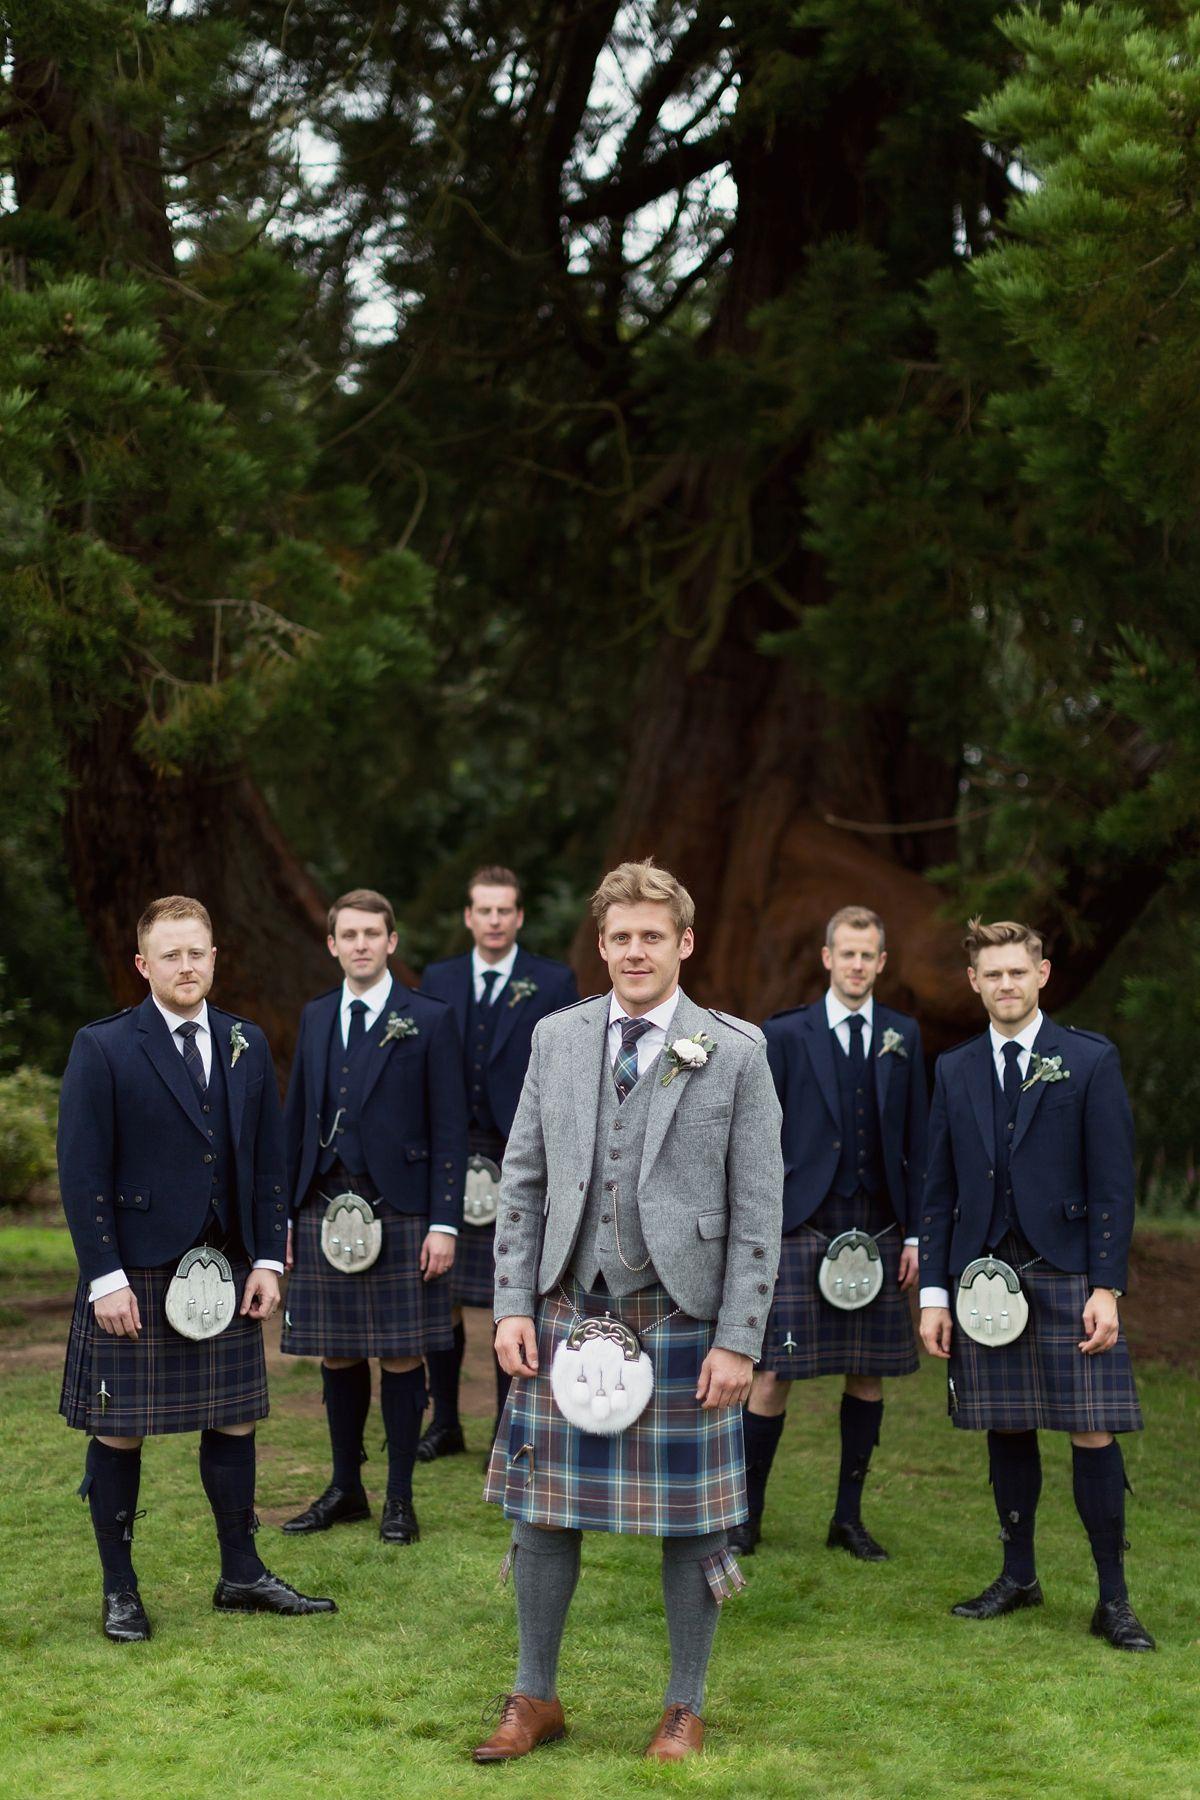 An Elegantly Beautiful Scottish Wedding Inspired by Nature